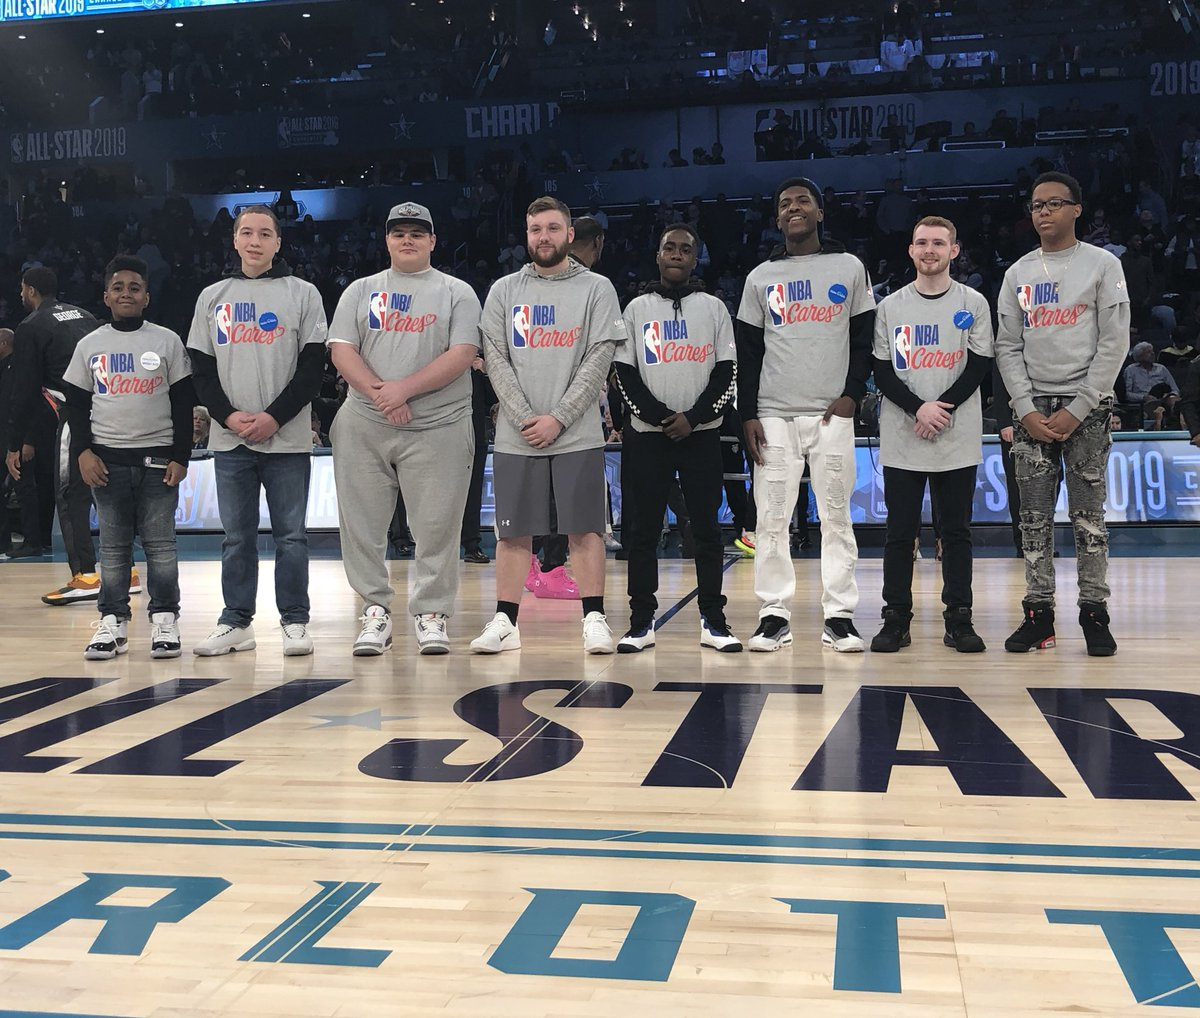 Our @MakeAWish All-Stars take center court in Charlotte! #NBAAllStar